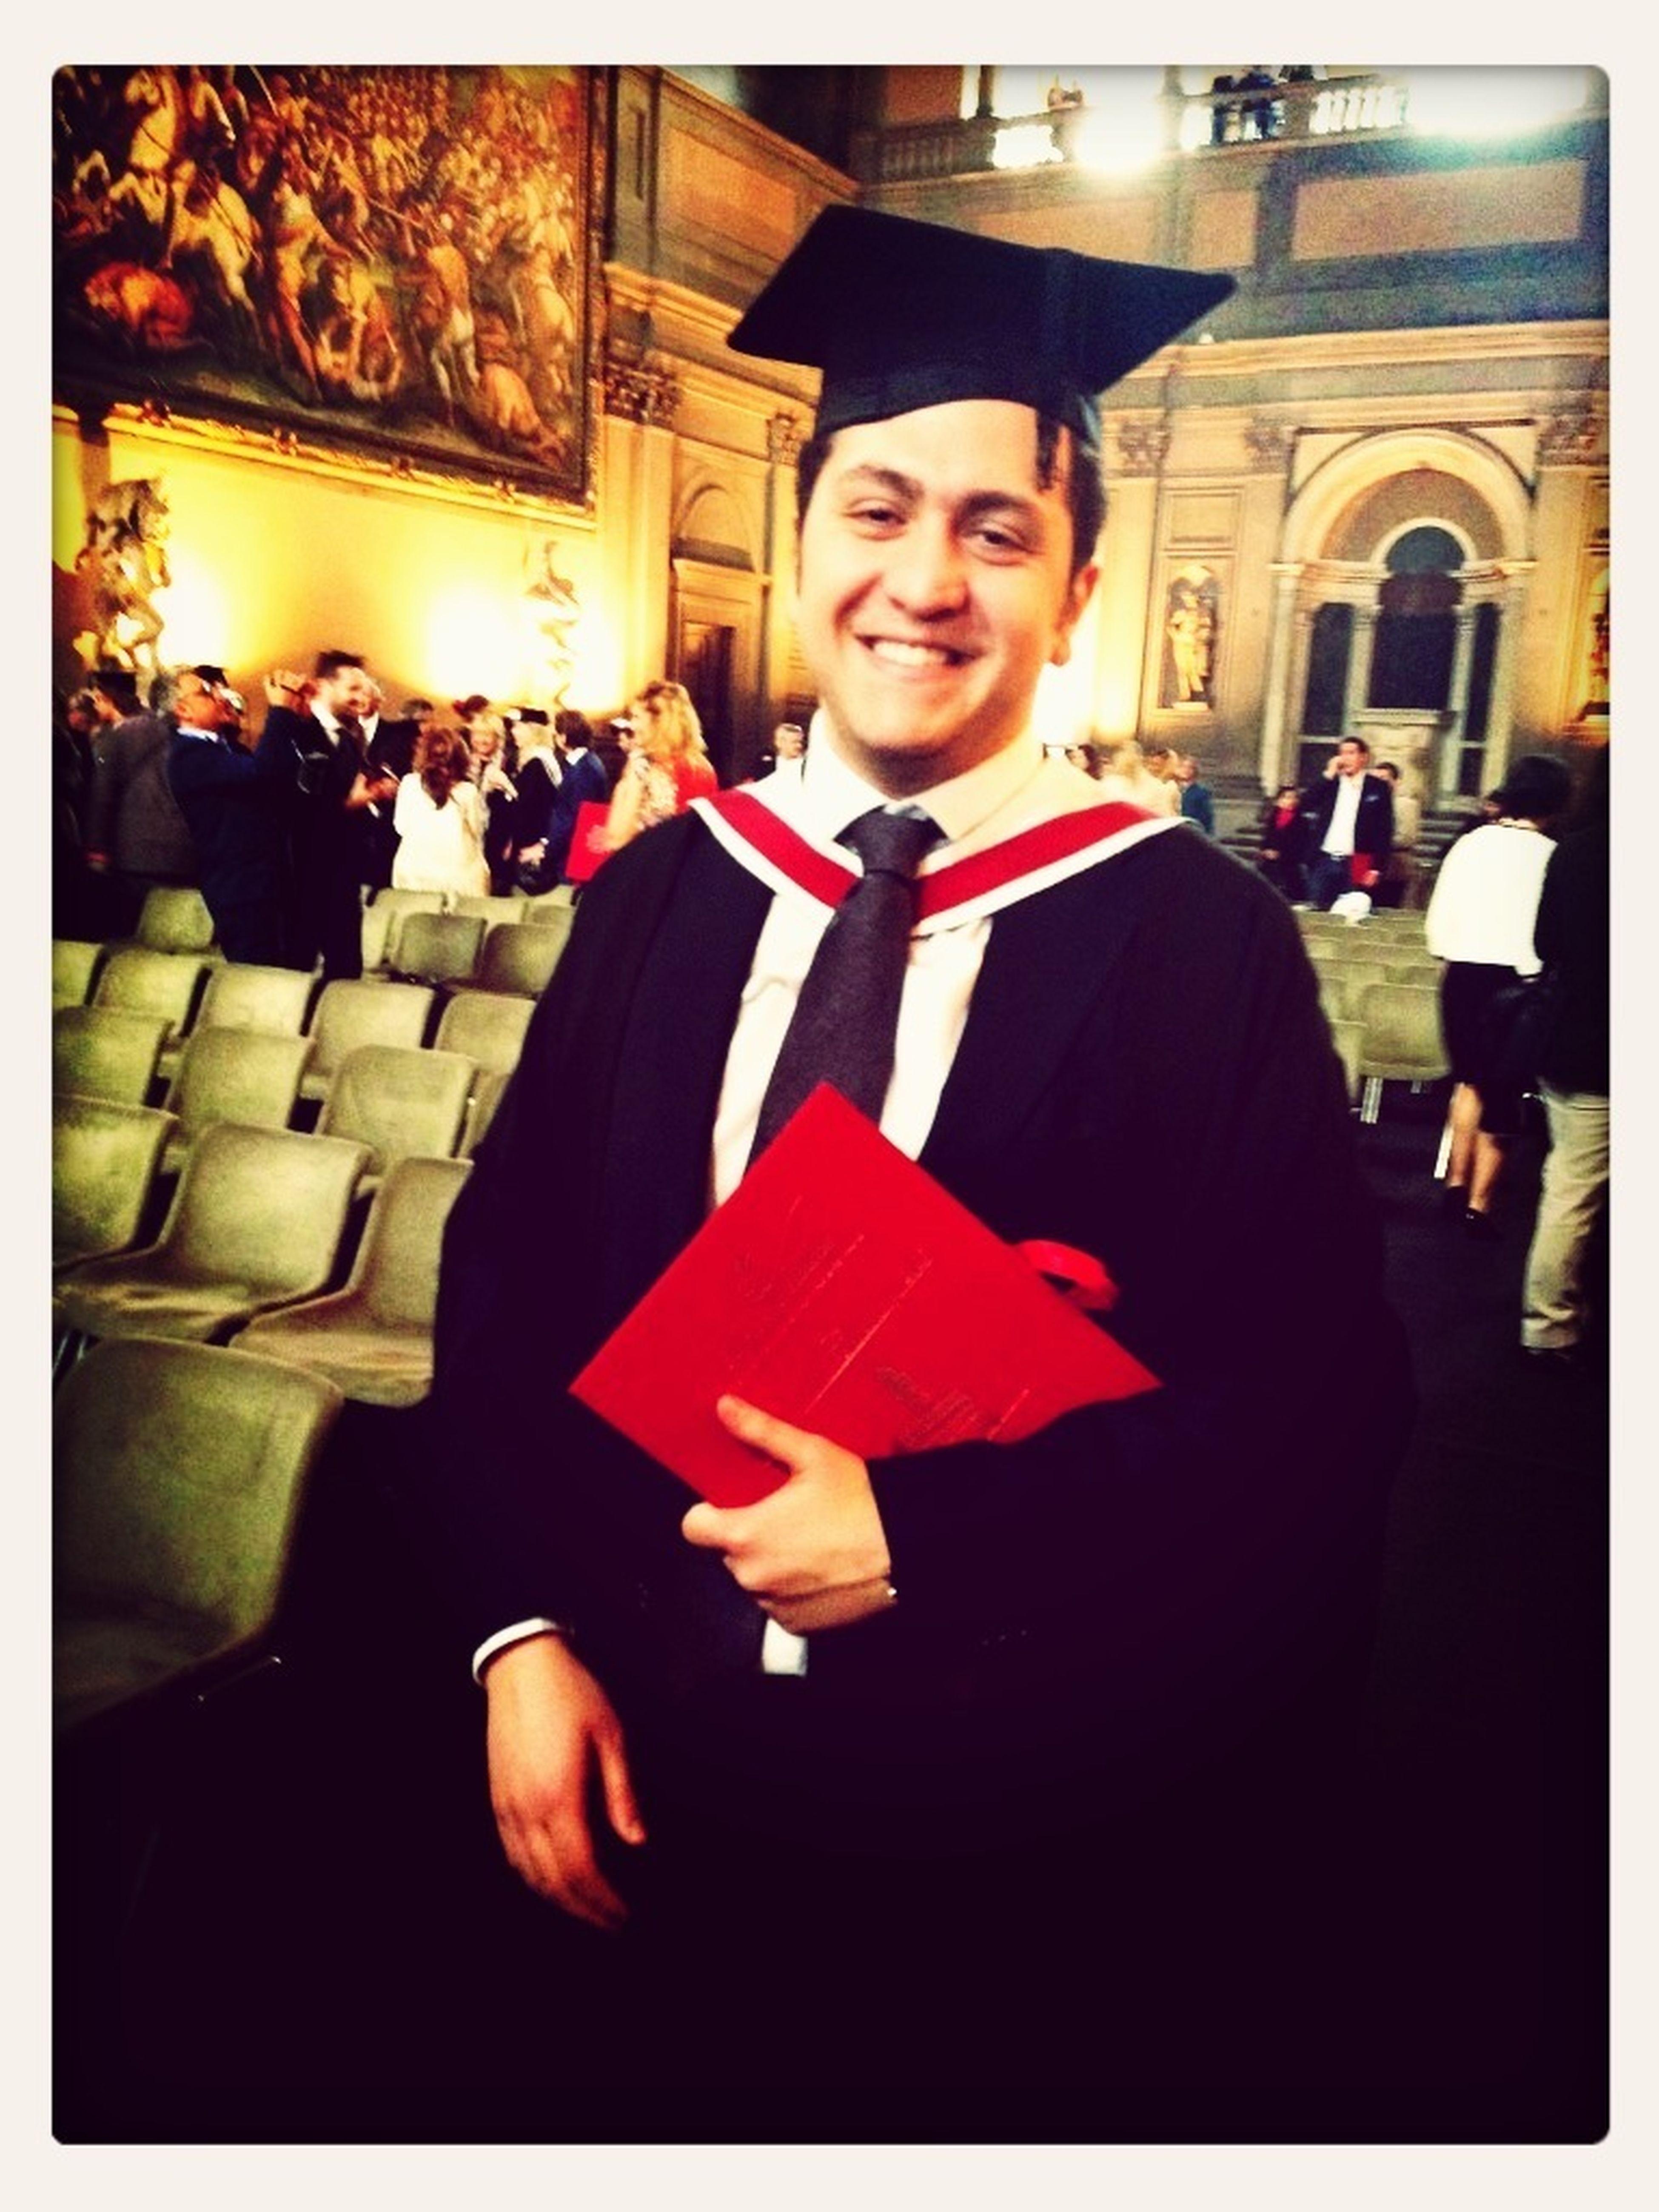 My Bro Graduated